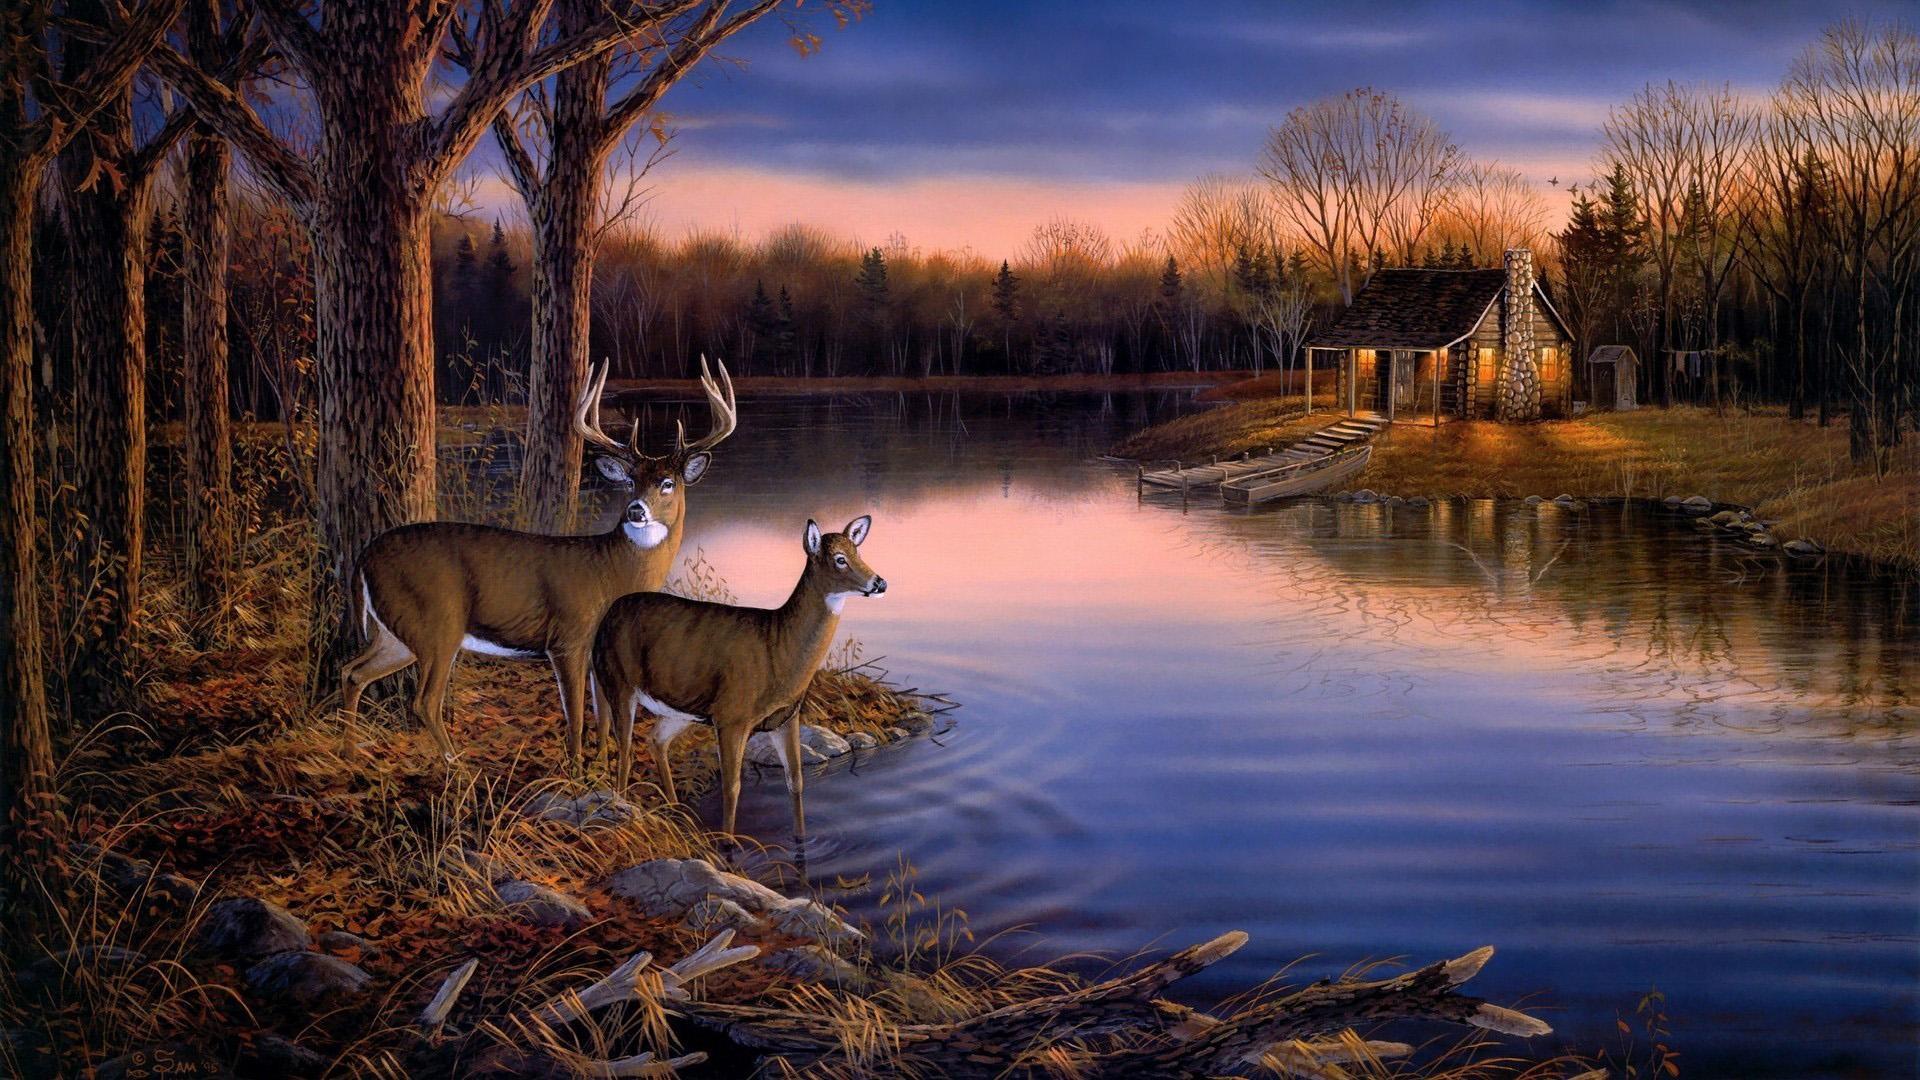 Deer Hunting Wallpaper Border | … ,landscape wallpaper Picture  1080p hd wallpaper